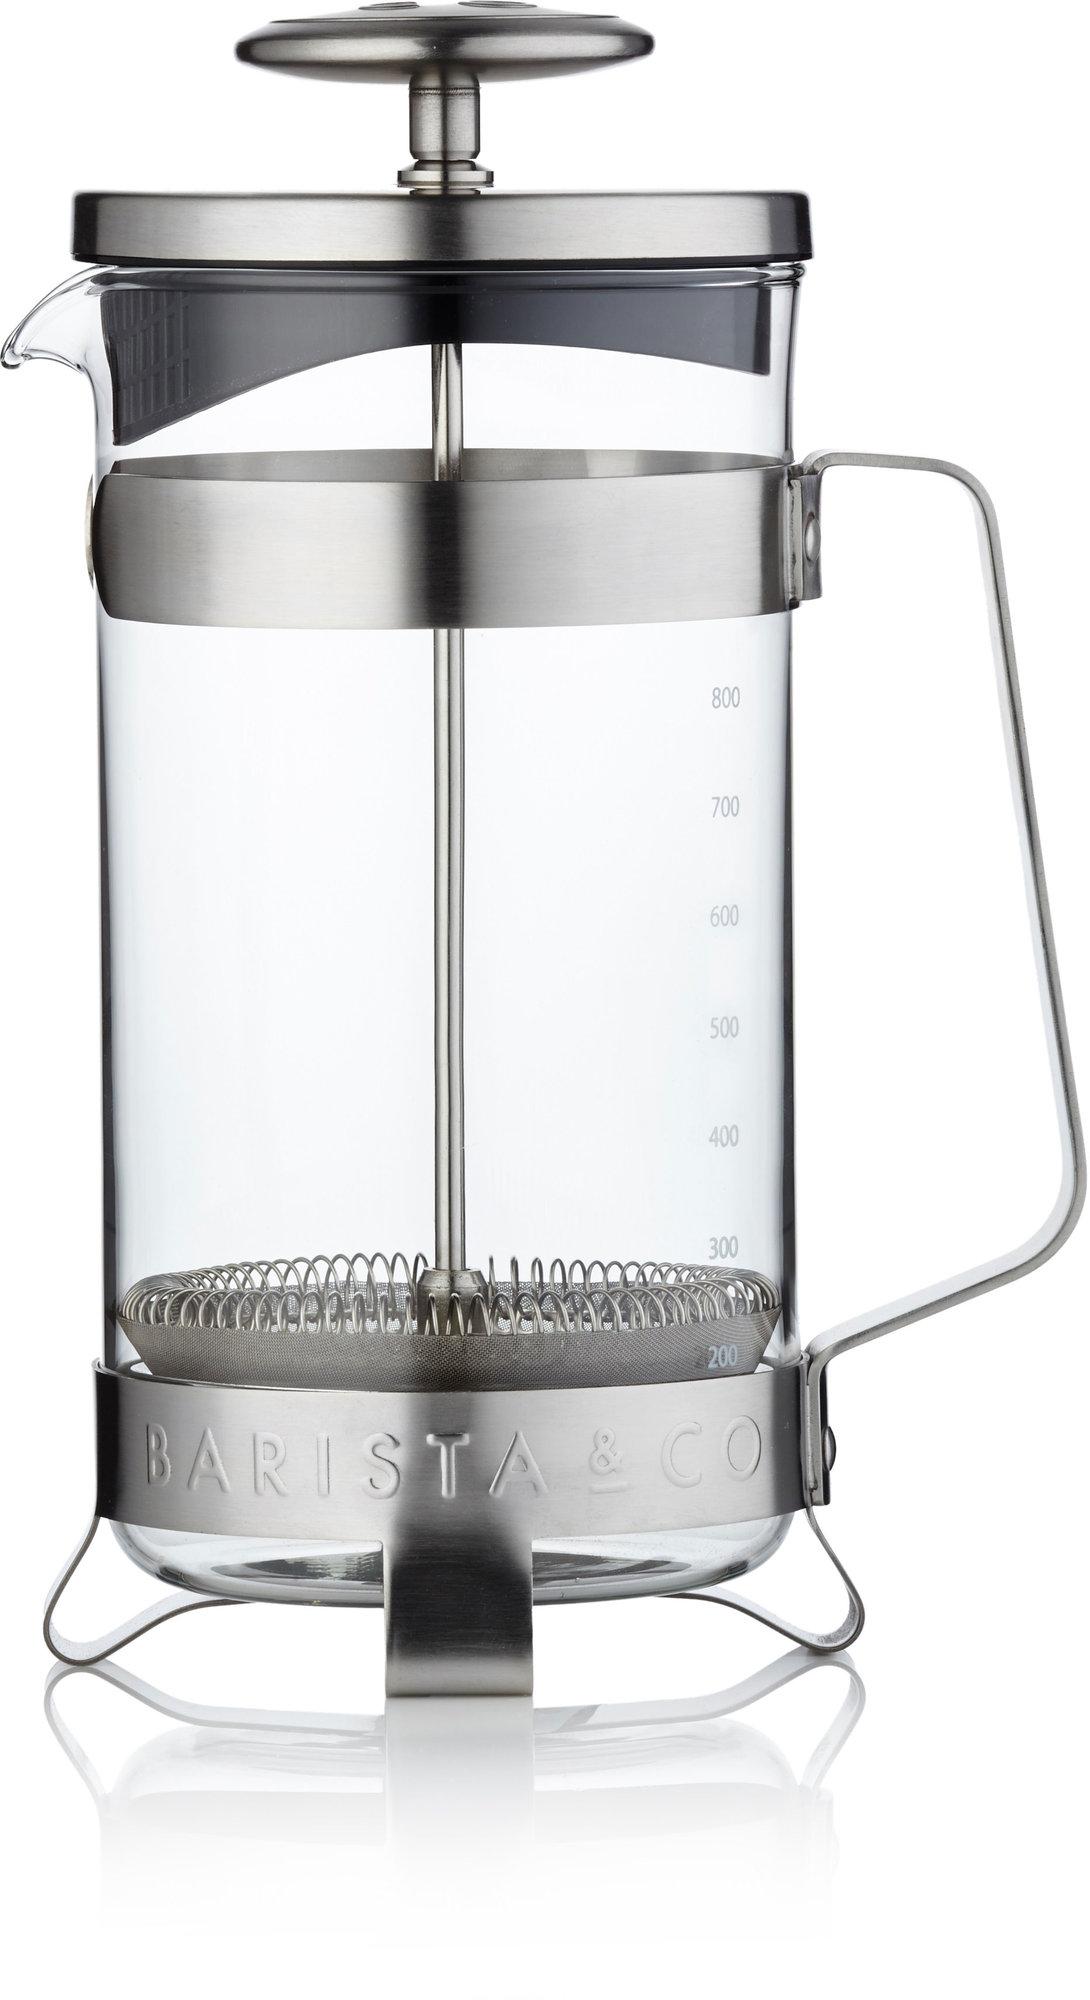 Barista & Co Stempelkanne børstet stål 8 kopper